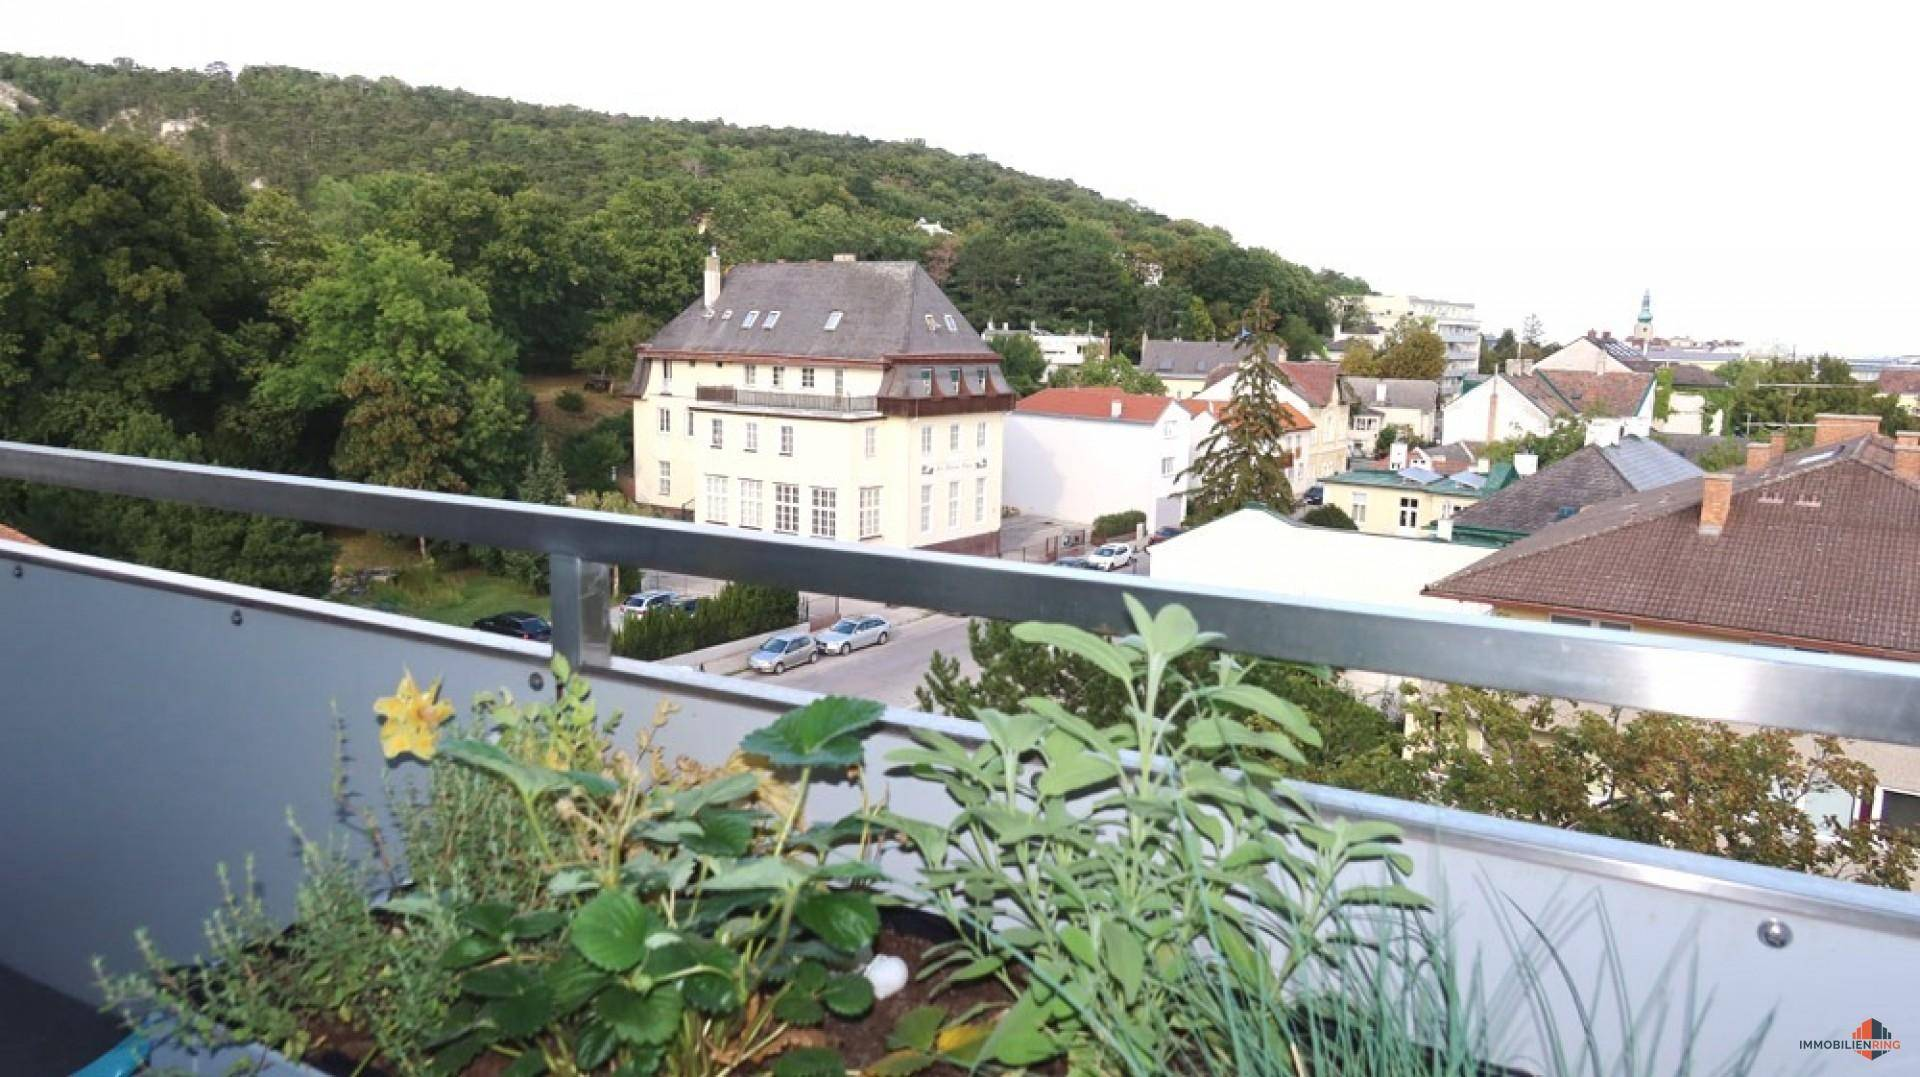 NÄHE DOBLHOFFPARK - Baden